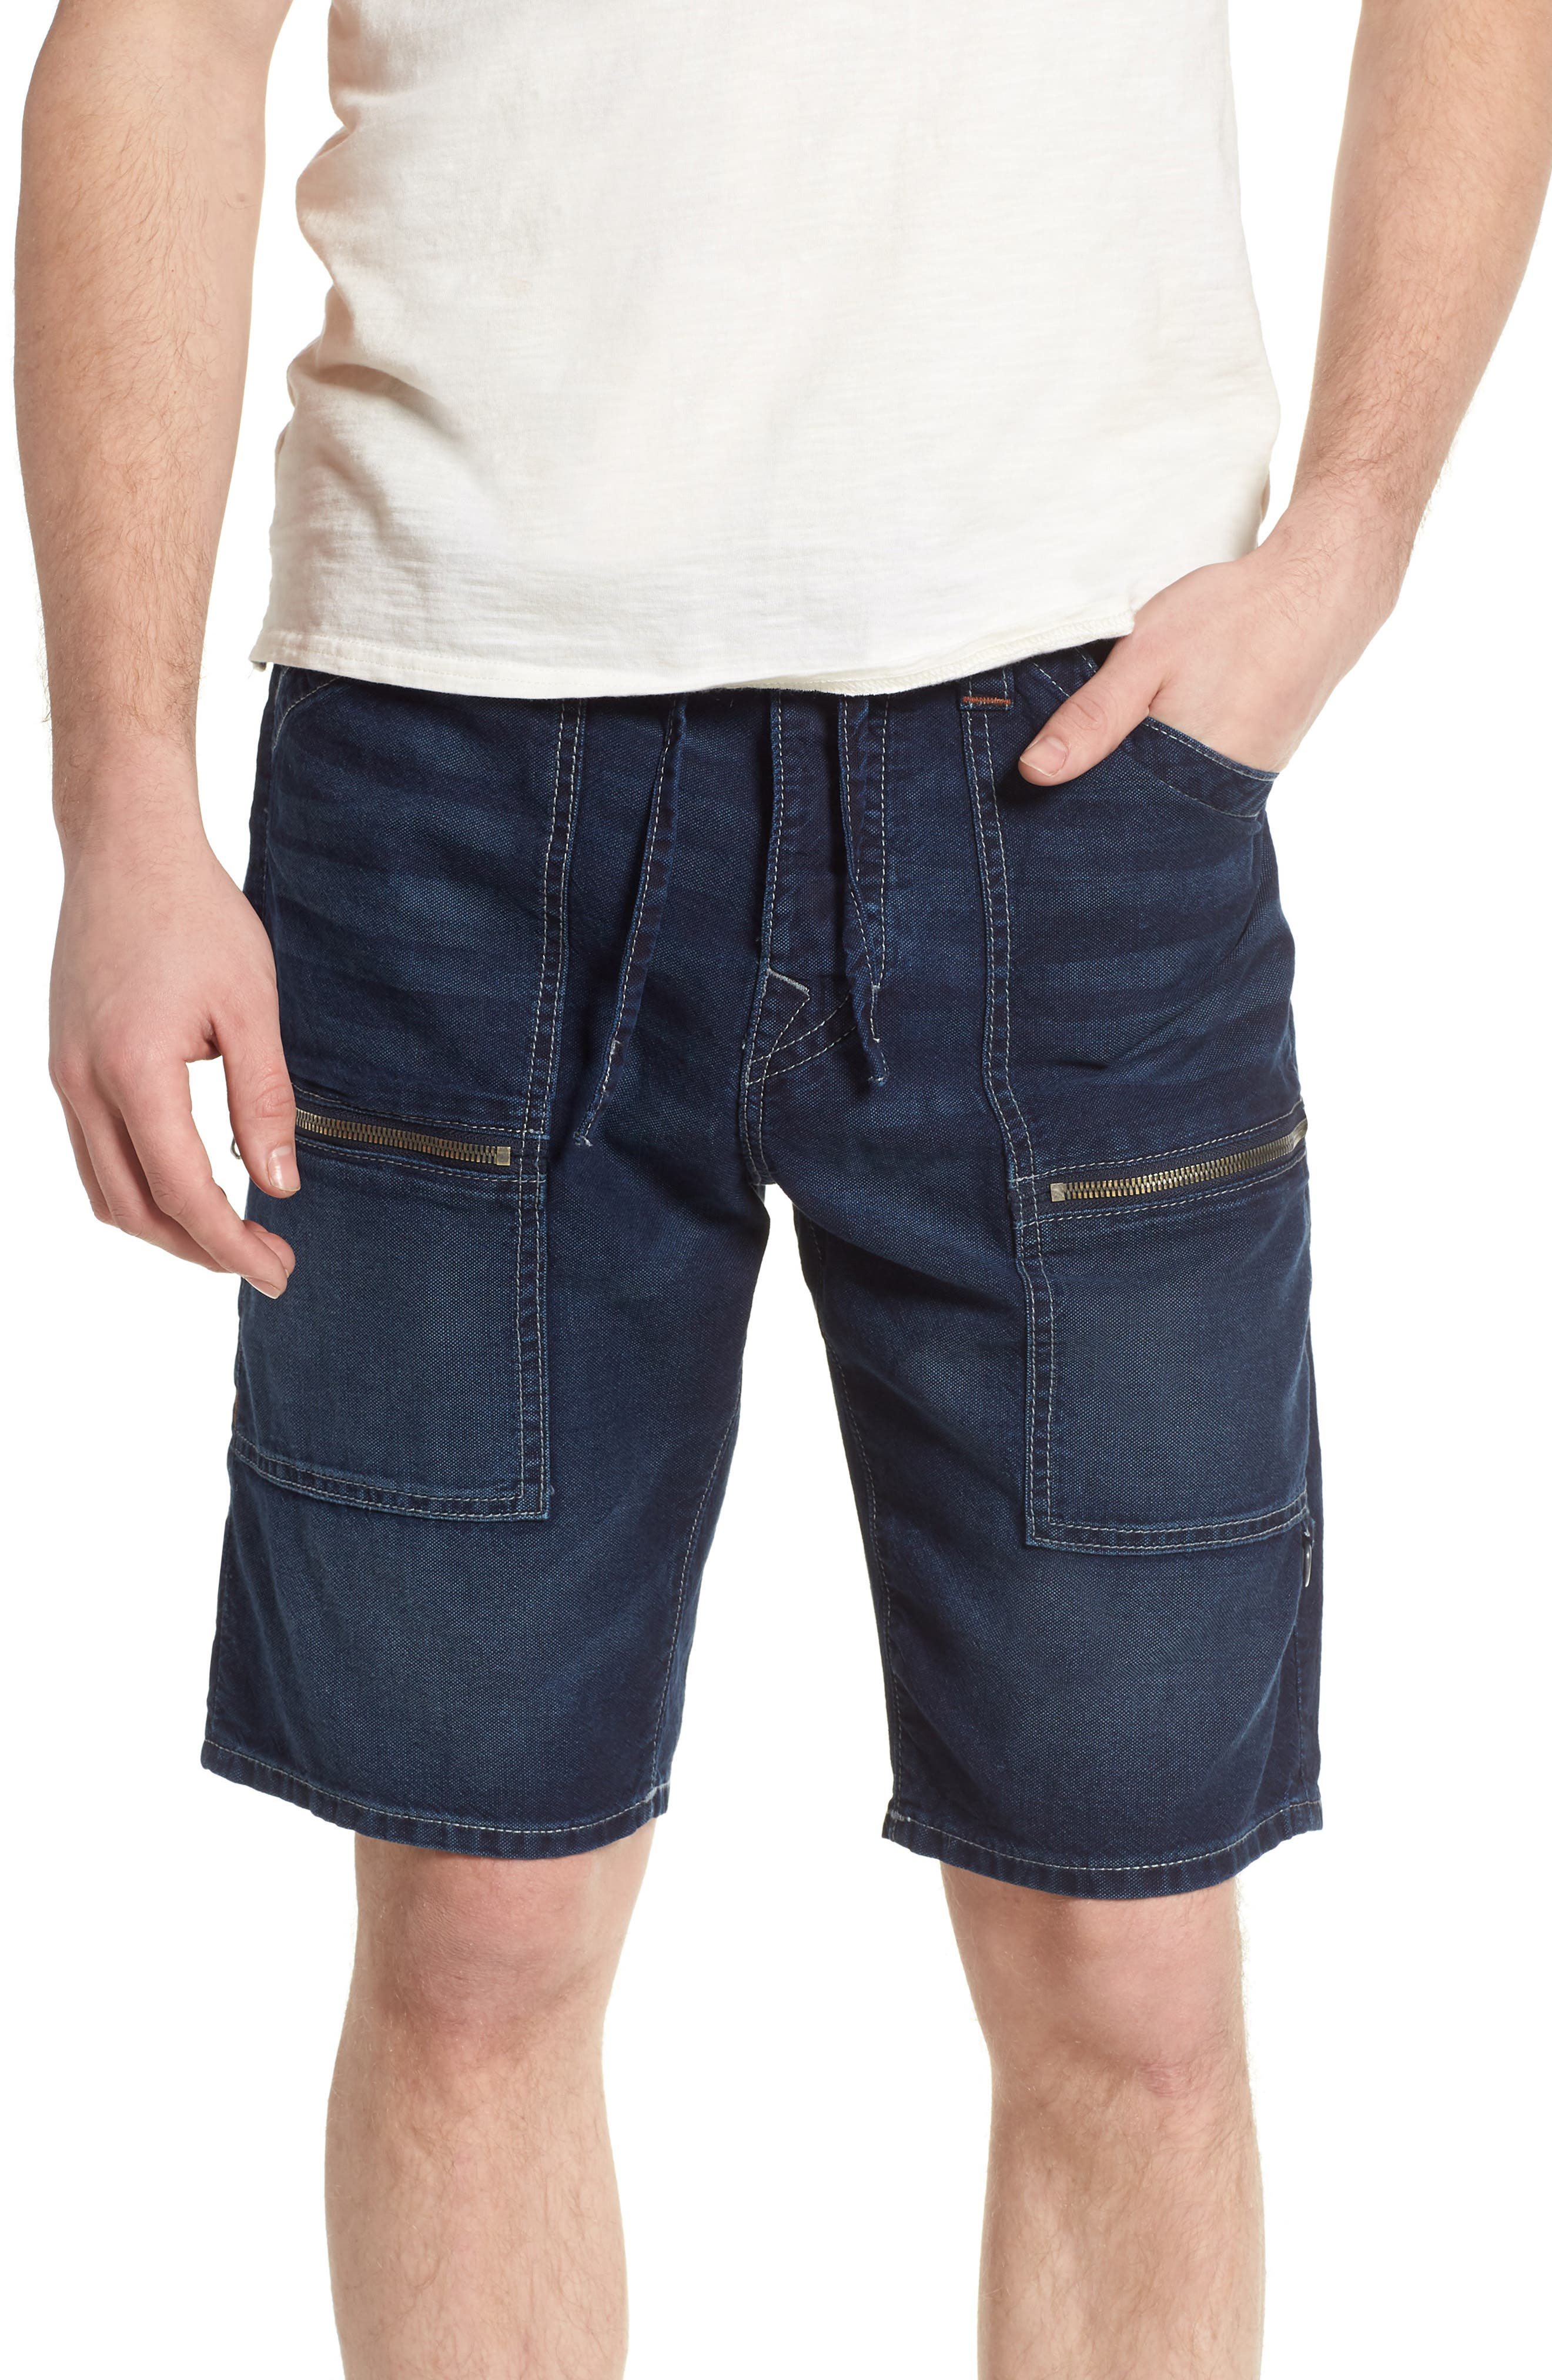 True Religion Brand Jeans Trail Utility Shorts